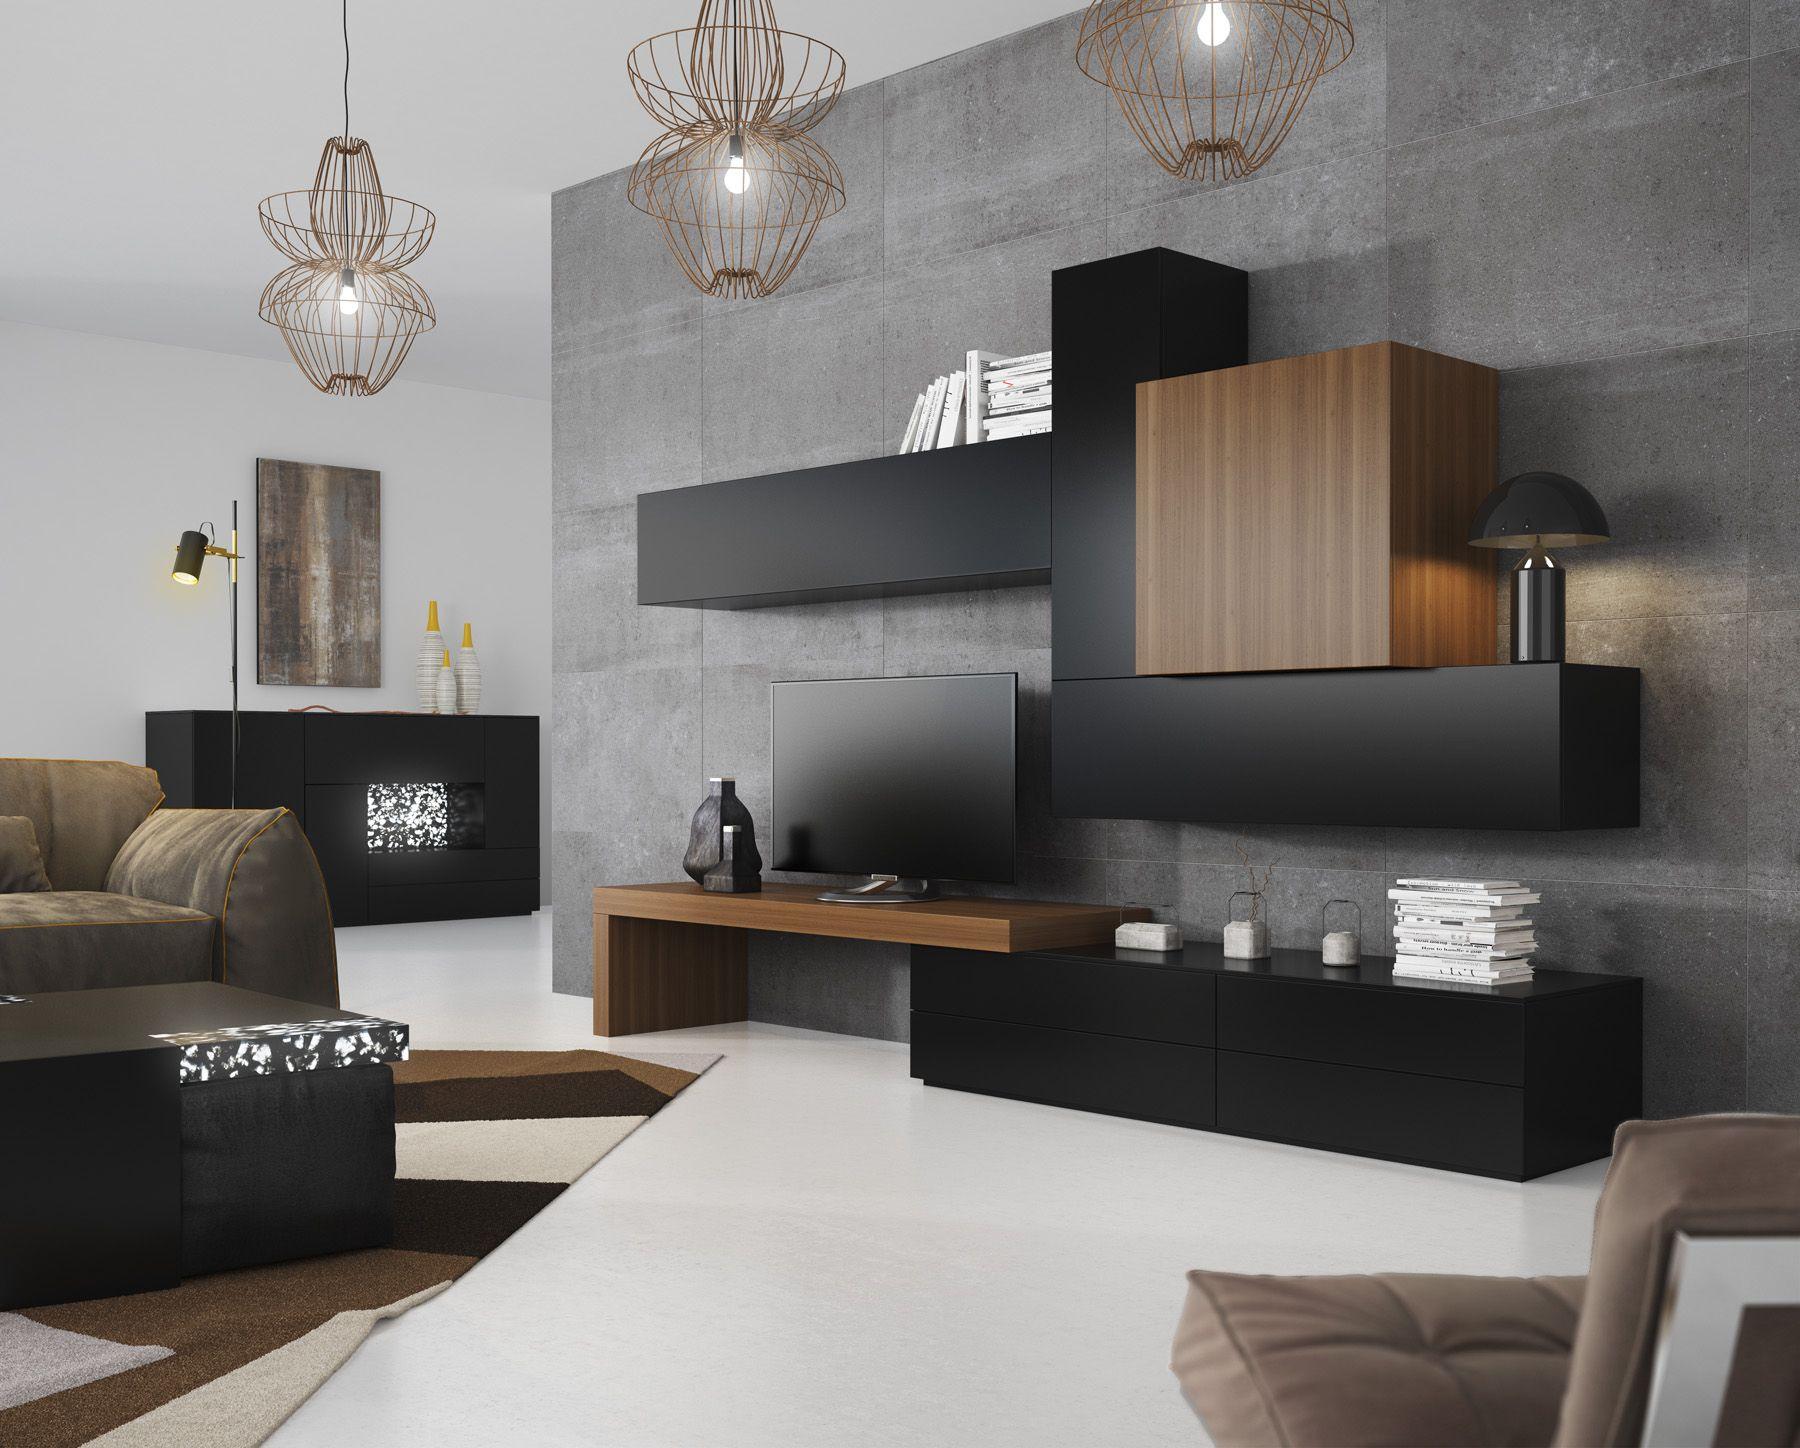 Colecci n ortus evolution comedores modernos muebles Comedores altos modernos